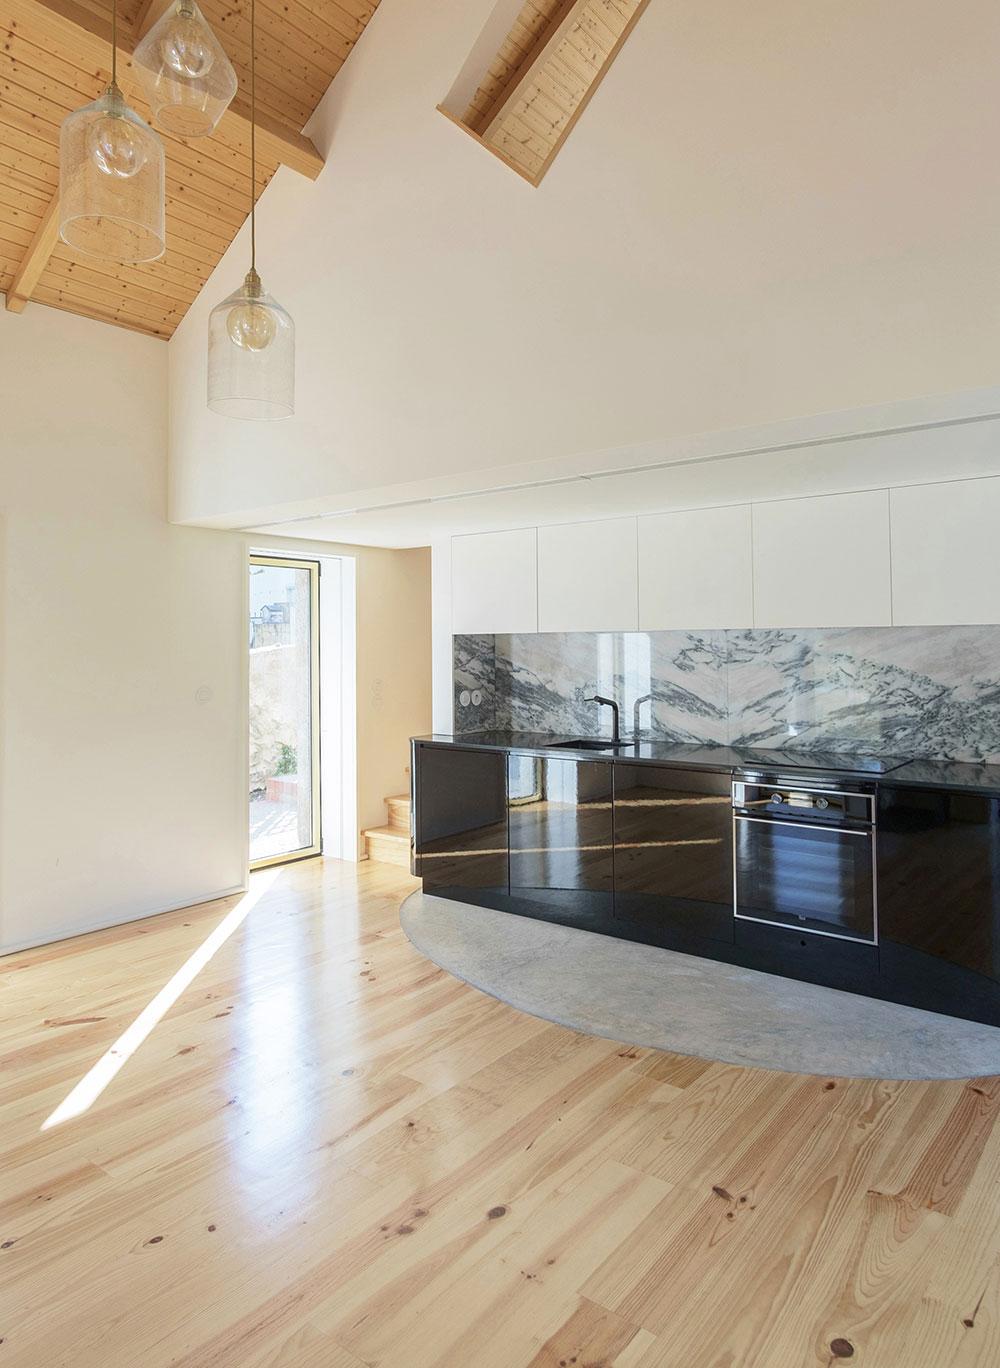 moderná kuchyňa s čiernou kuchynskou linkou